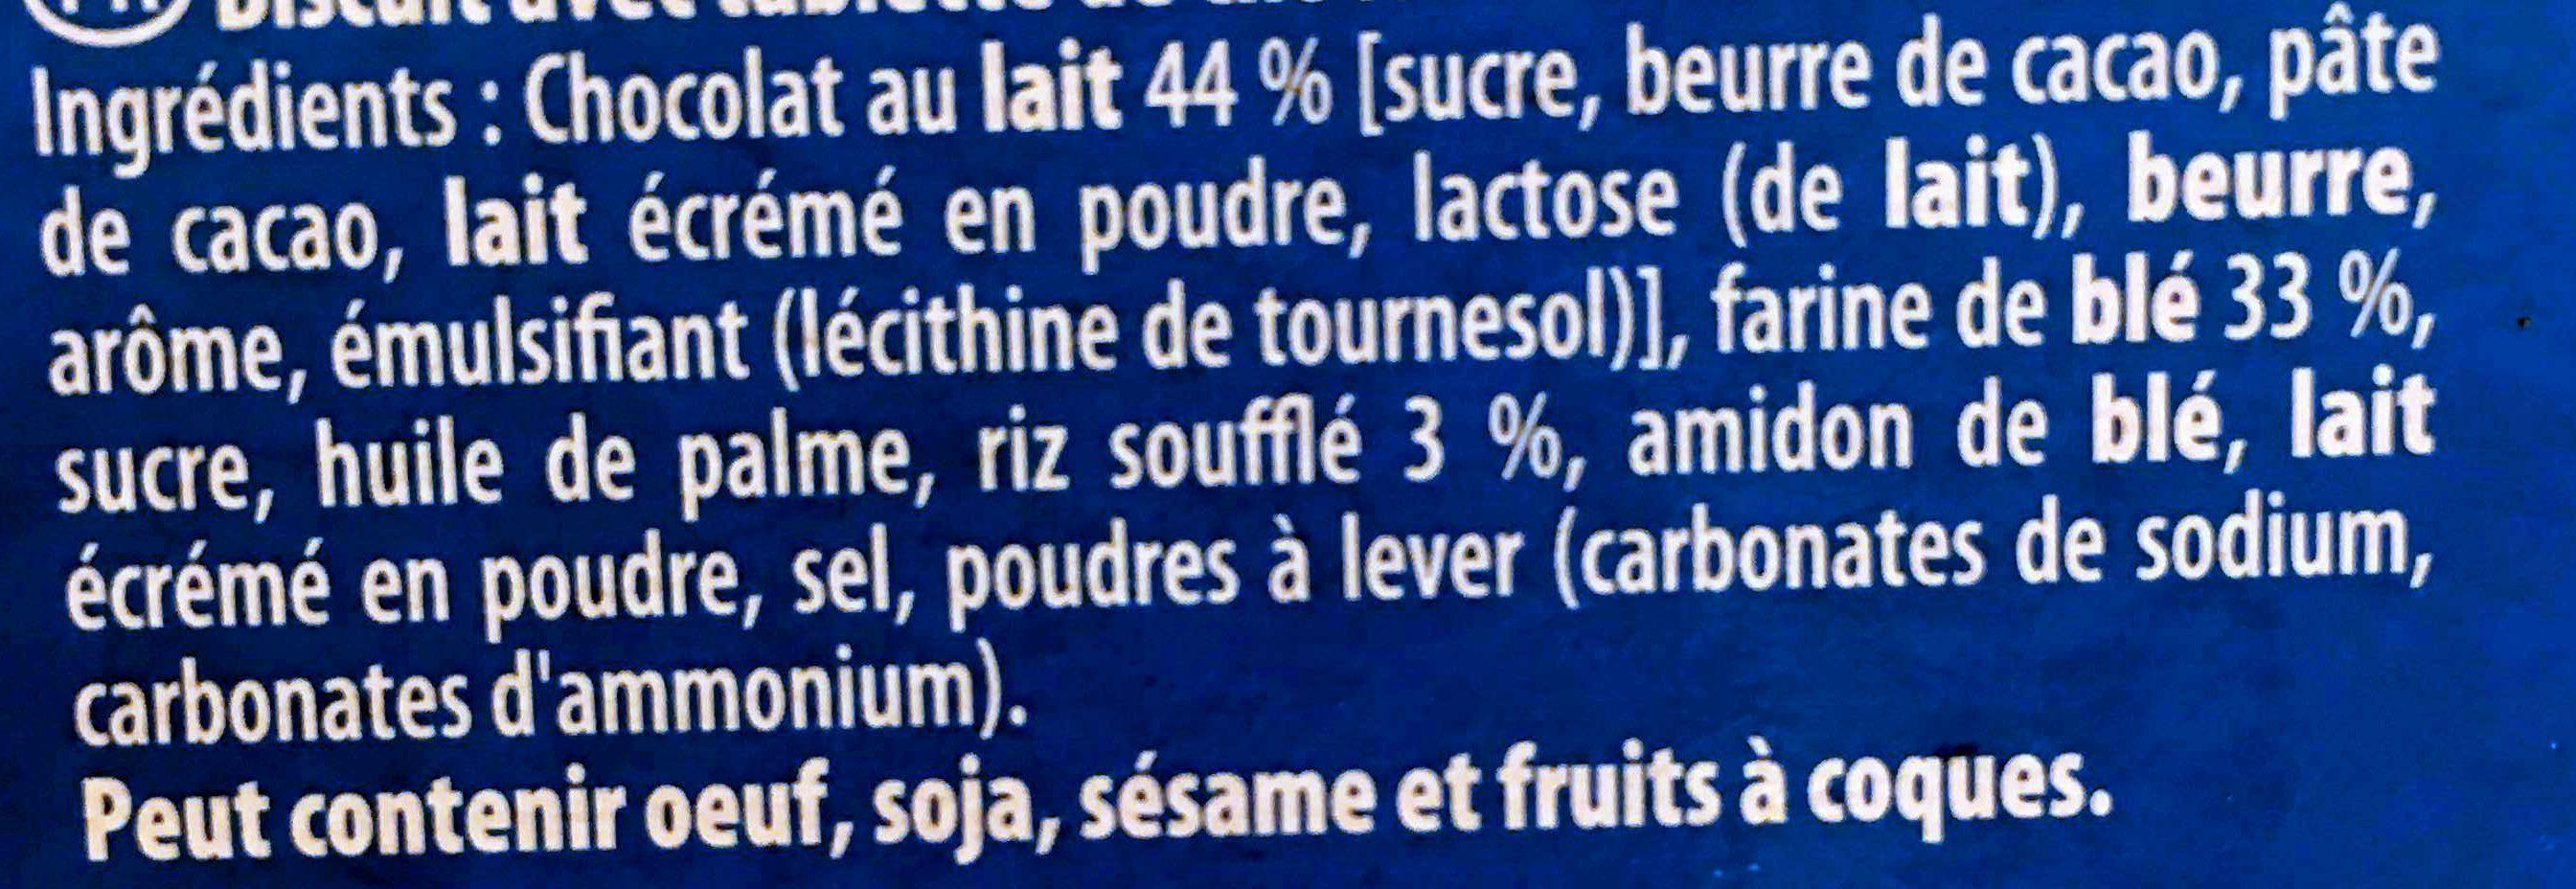 Petit écolier barres riz soufflé - Ingrediënten - fr